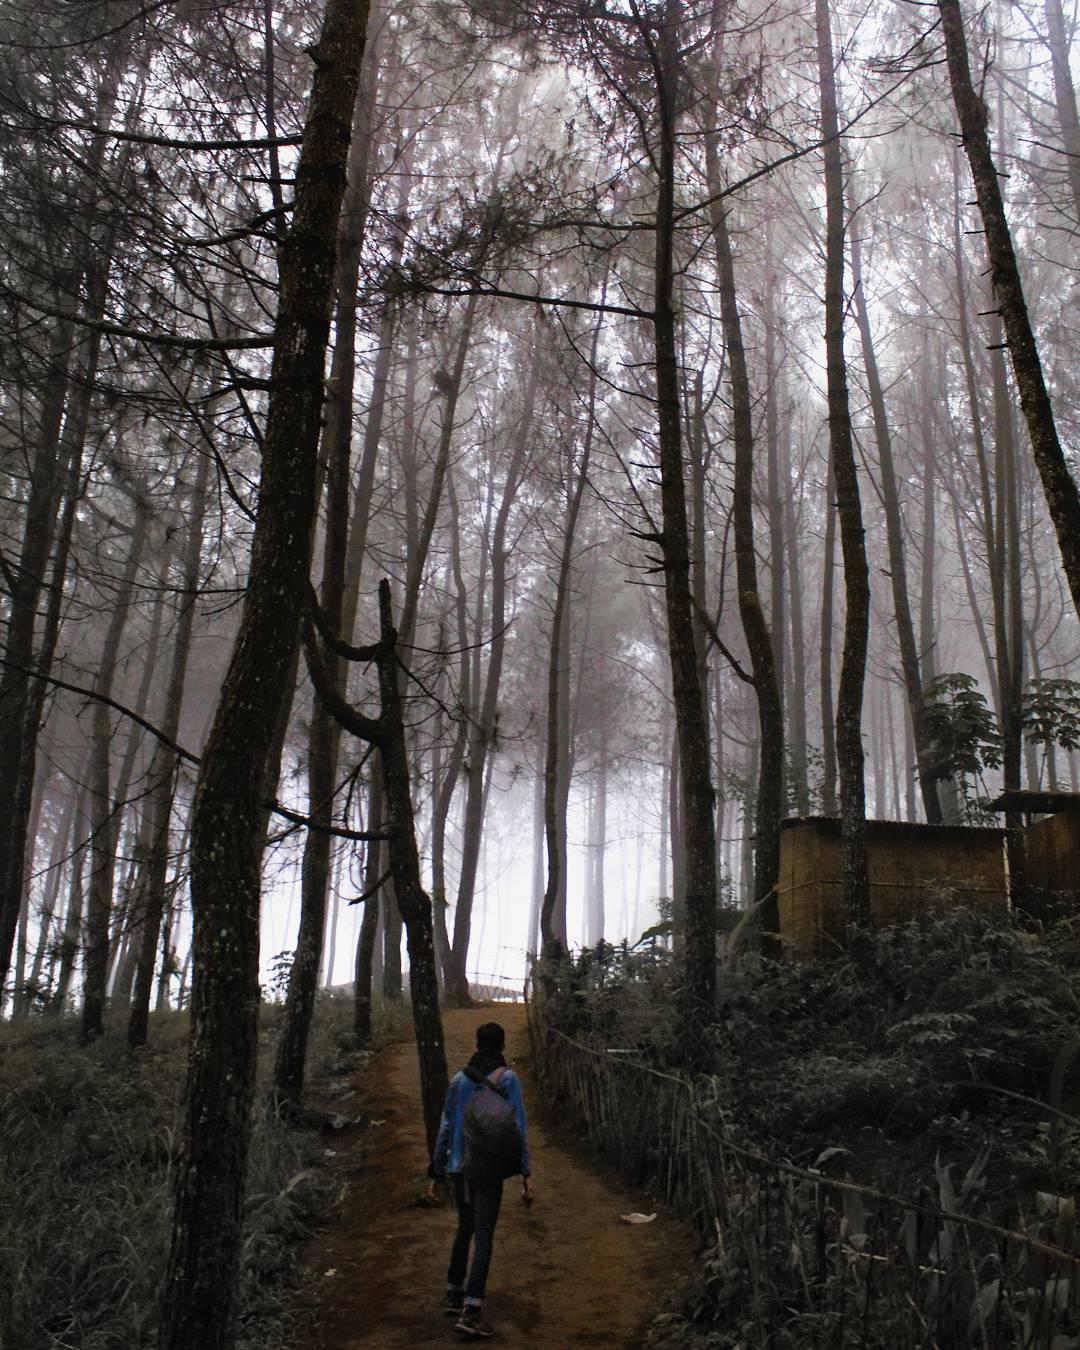 Kabut Hutan Pinus yang Menyimpan Misteri, Malang, Malang Raya, Dolan Dolen, Dolaners Kabut Hutan Pinus yang Misterius via bagoezduwi - Dolan Dolen